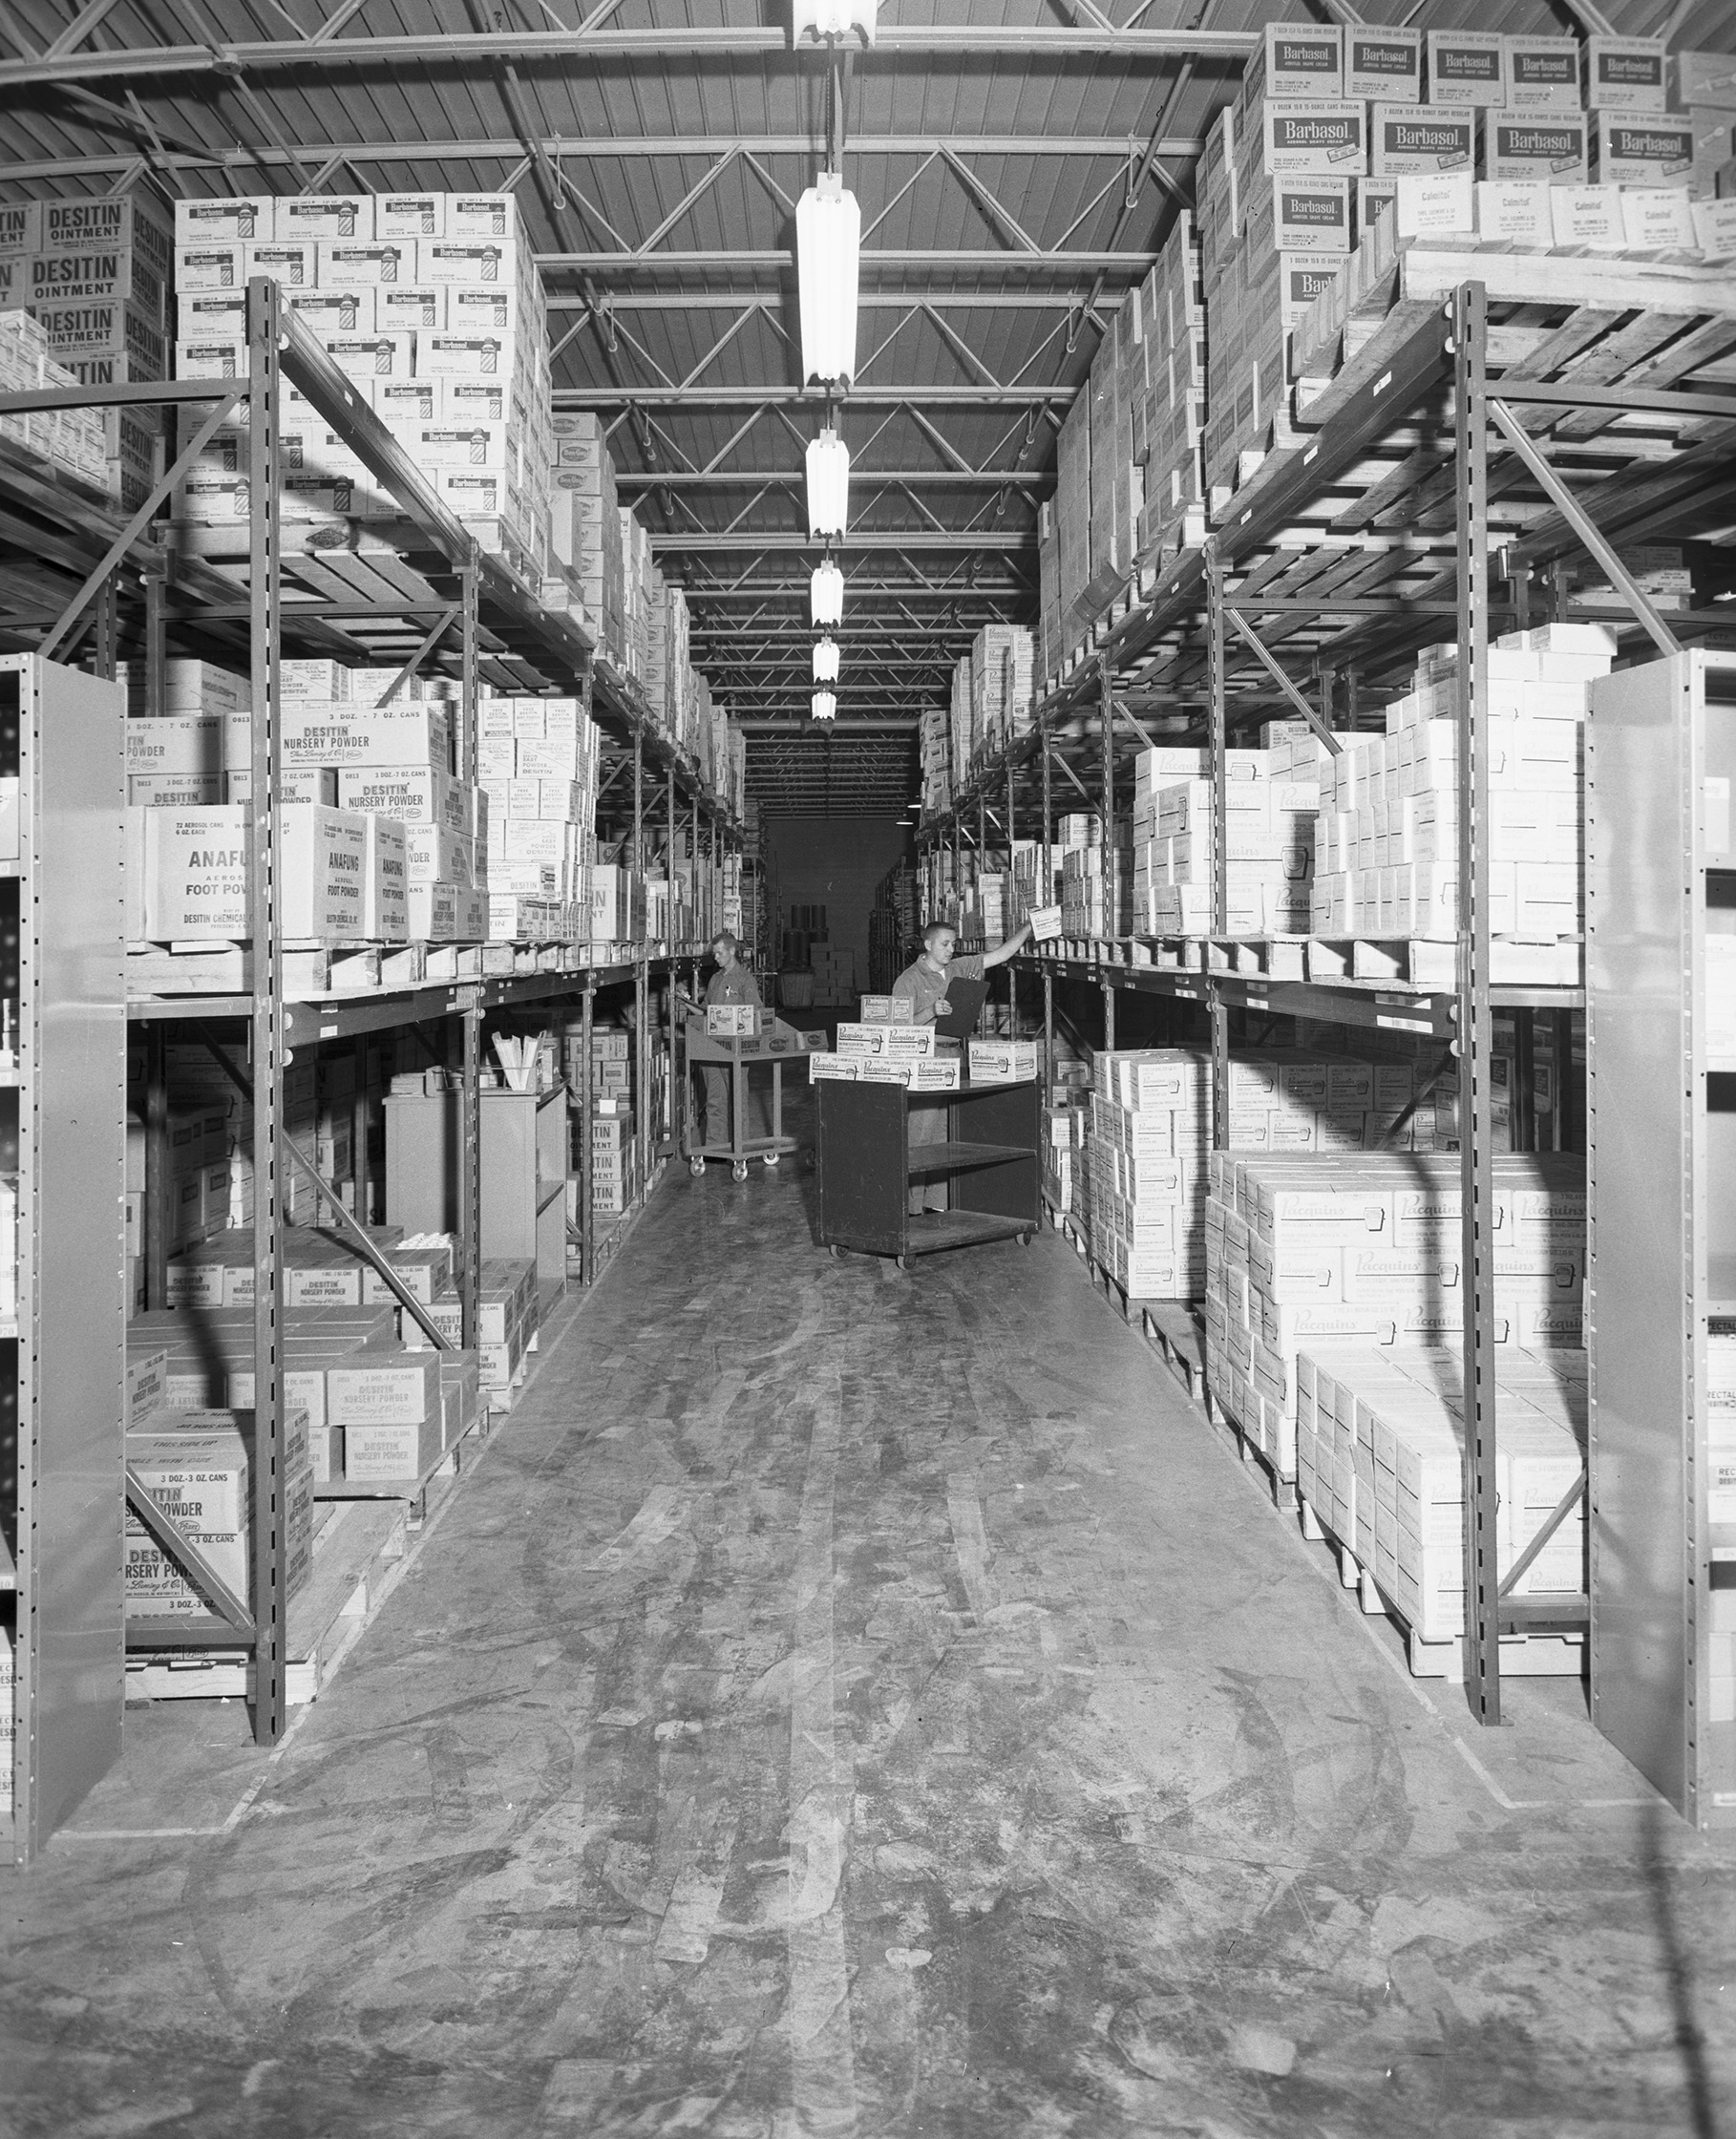 Pfizer Company Warehouse Uta Libraries Digital Gallery